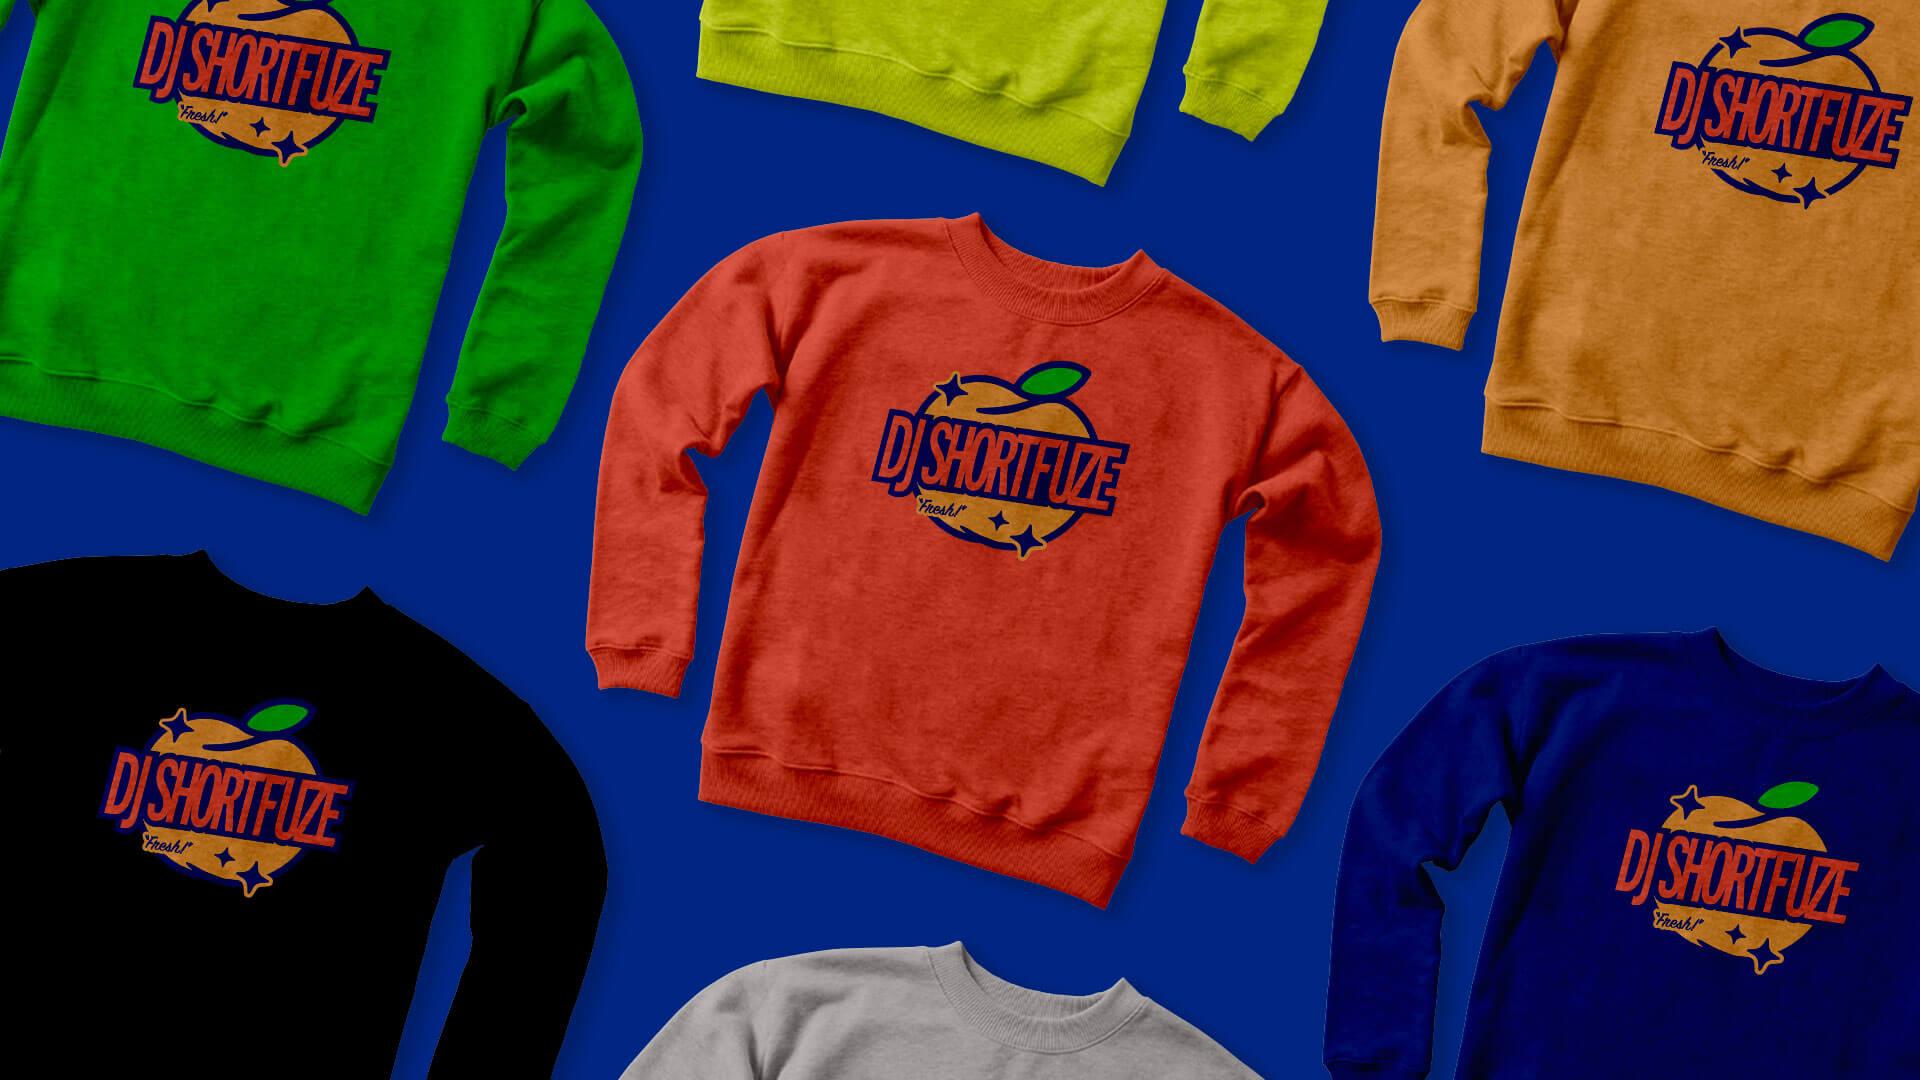 Shortfuze-Sweaters_1920px